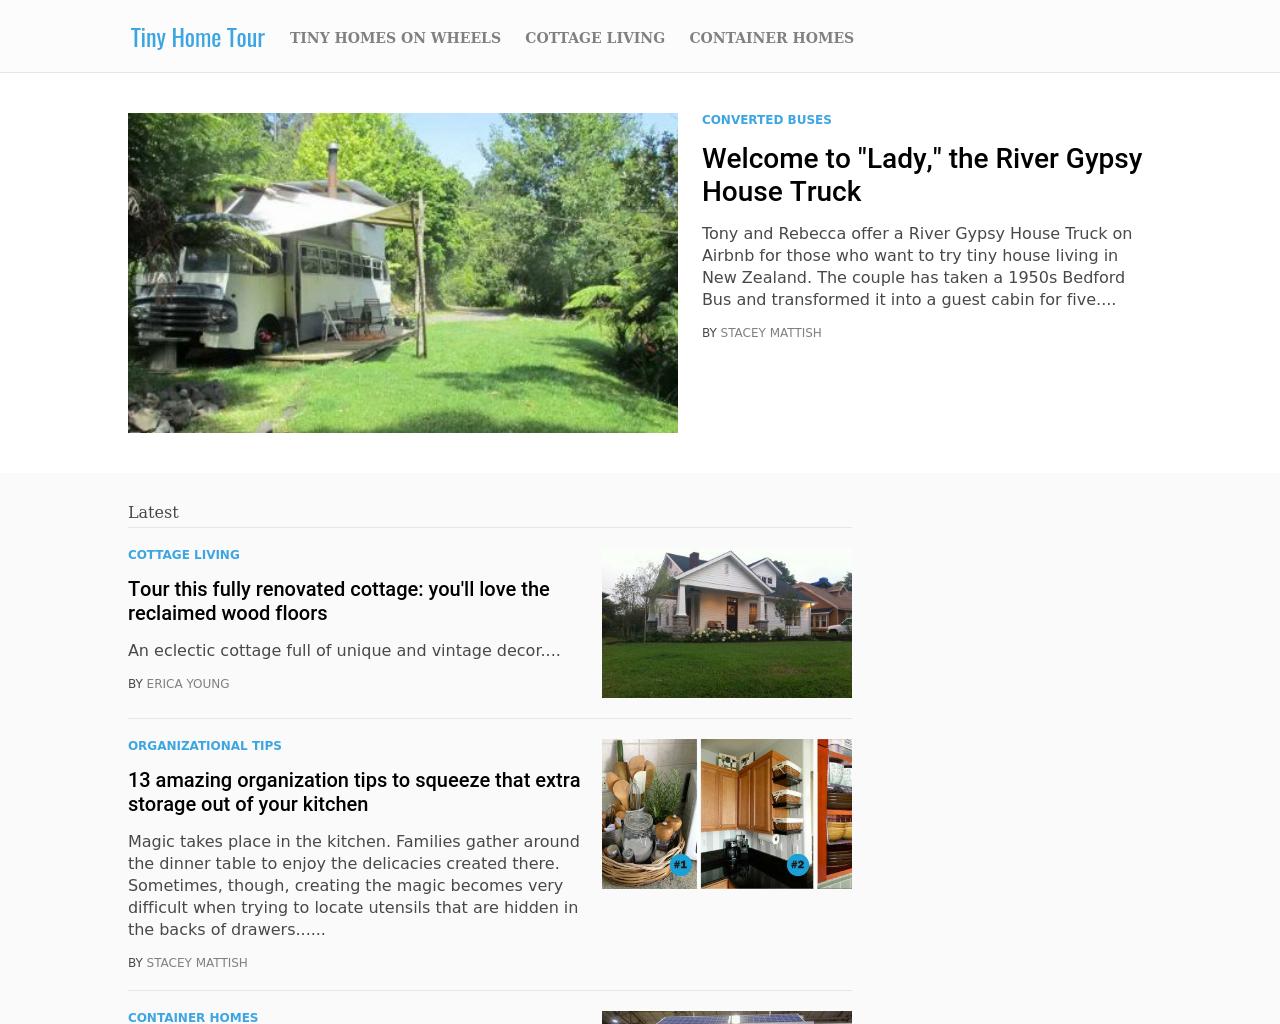 Tiny-Home-Tour-Advertising-Reviews-Pricing